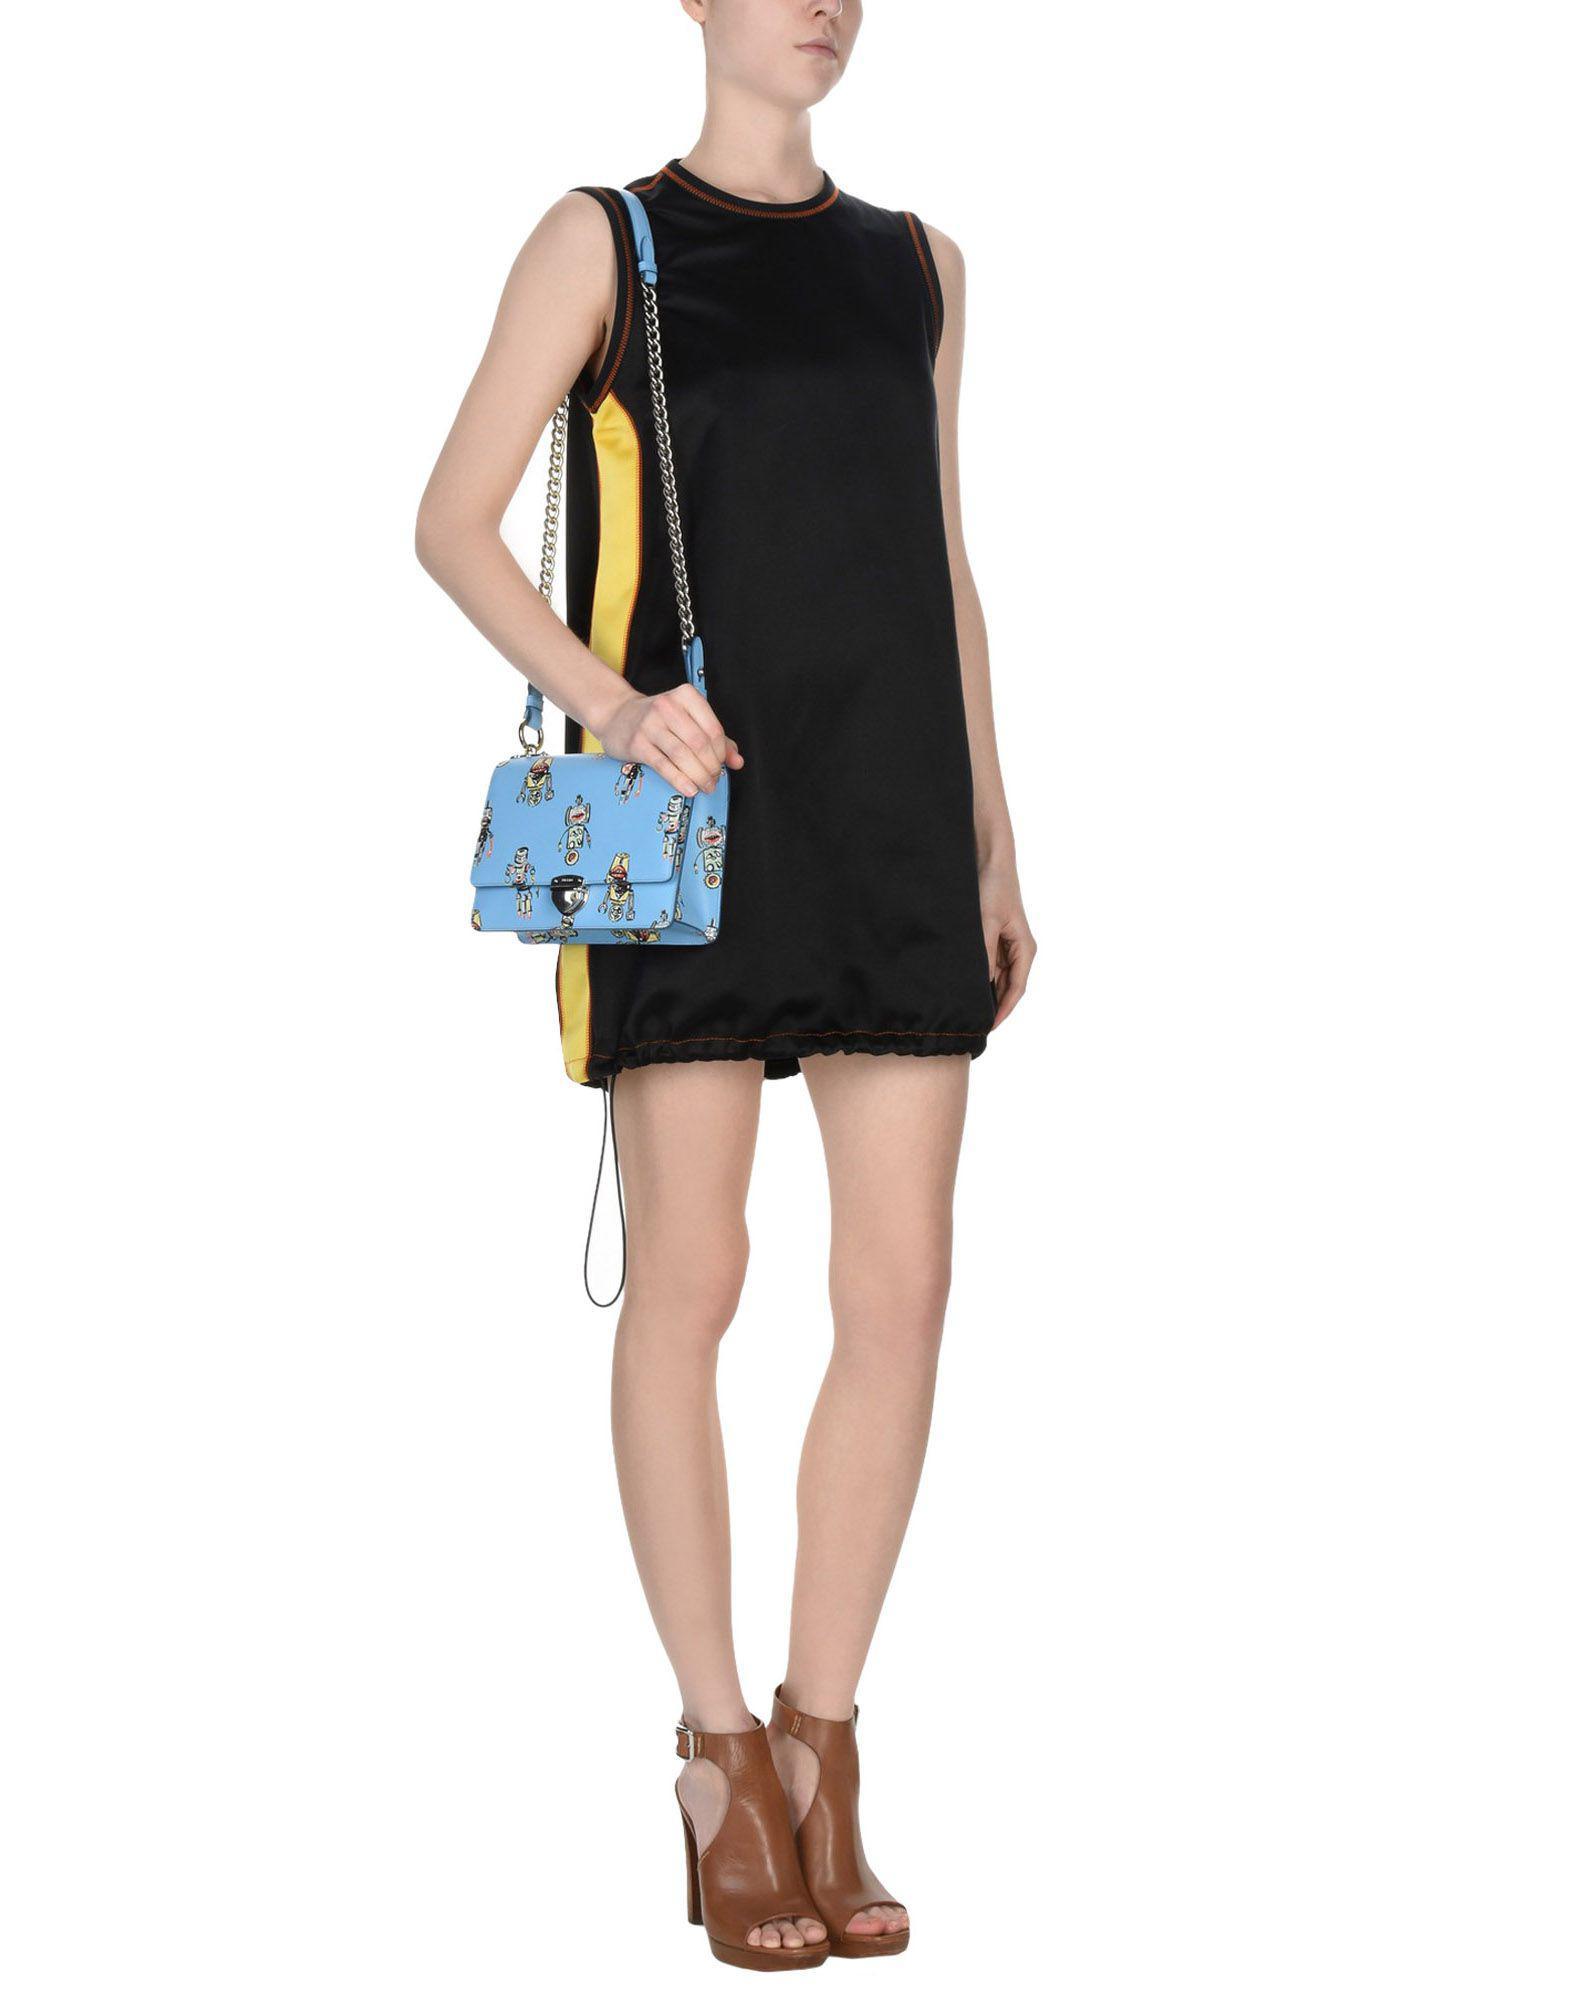 Prada Leather Cross-body Bag in Sky Blue (Blue)